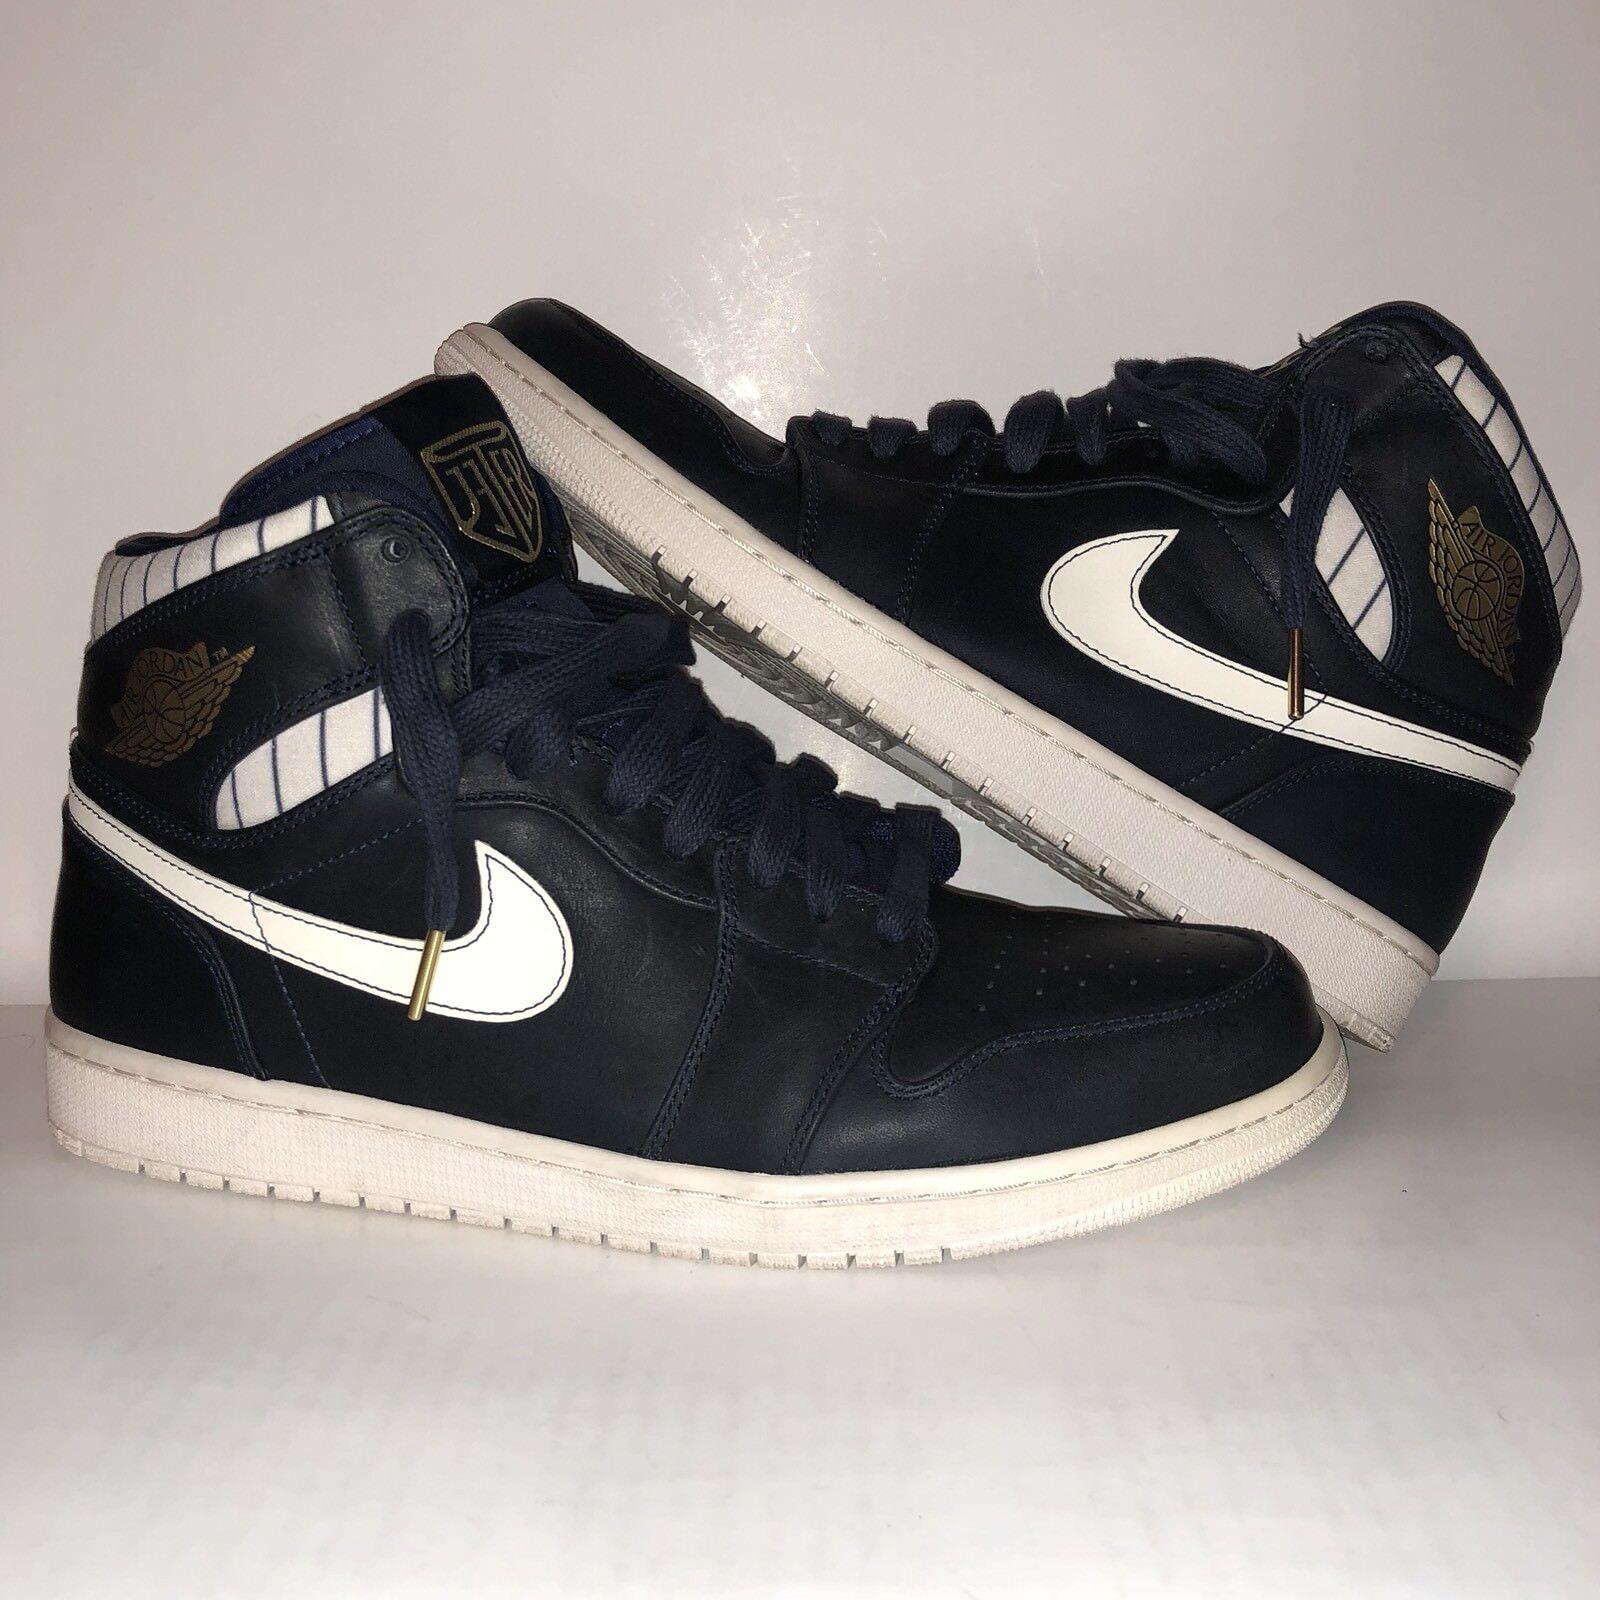 Nike Air Jordan Retro 1 High Jeter Midnight Navy Metallic gold 715854-402 Sz 14